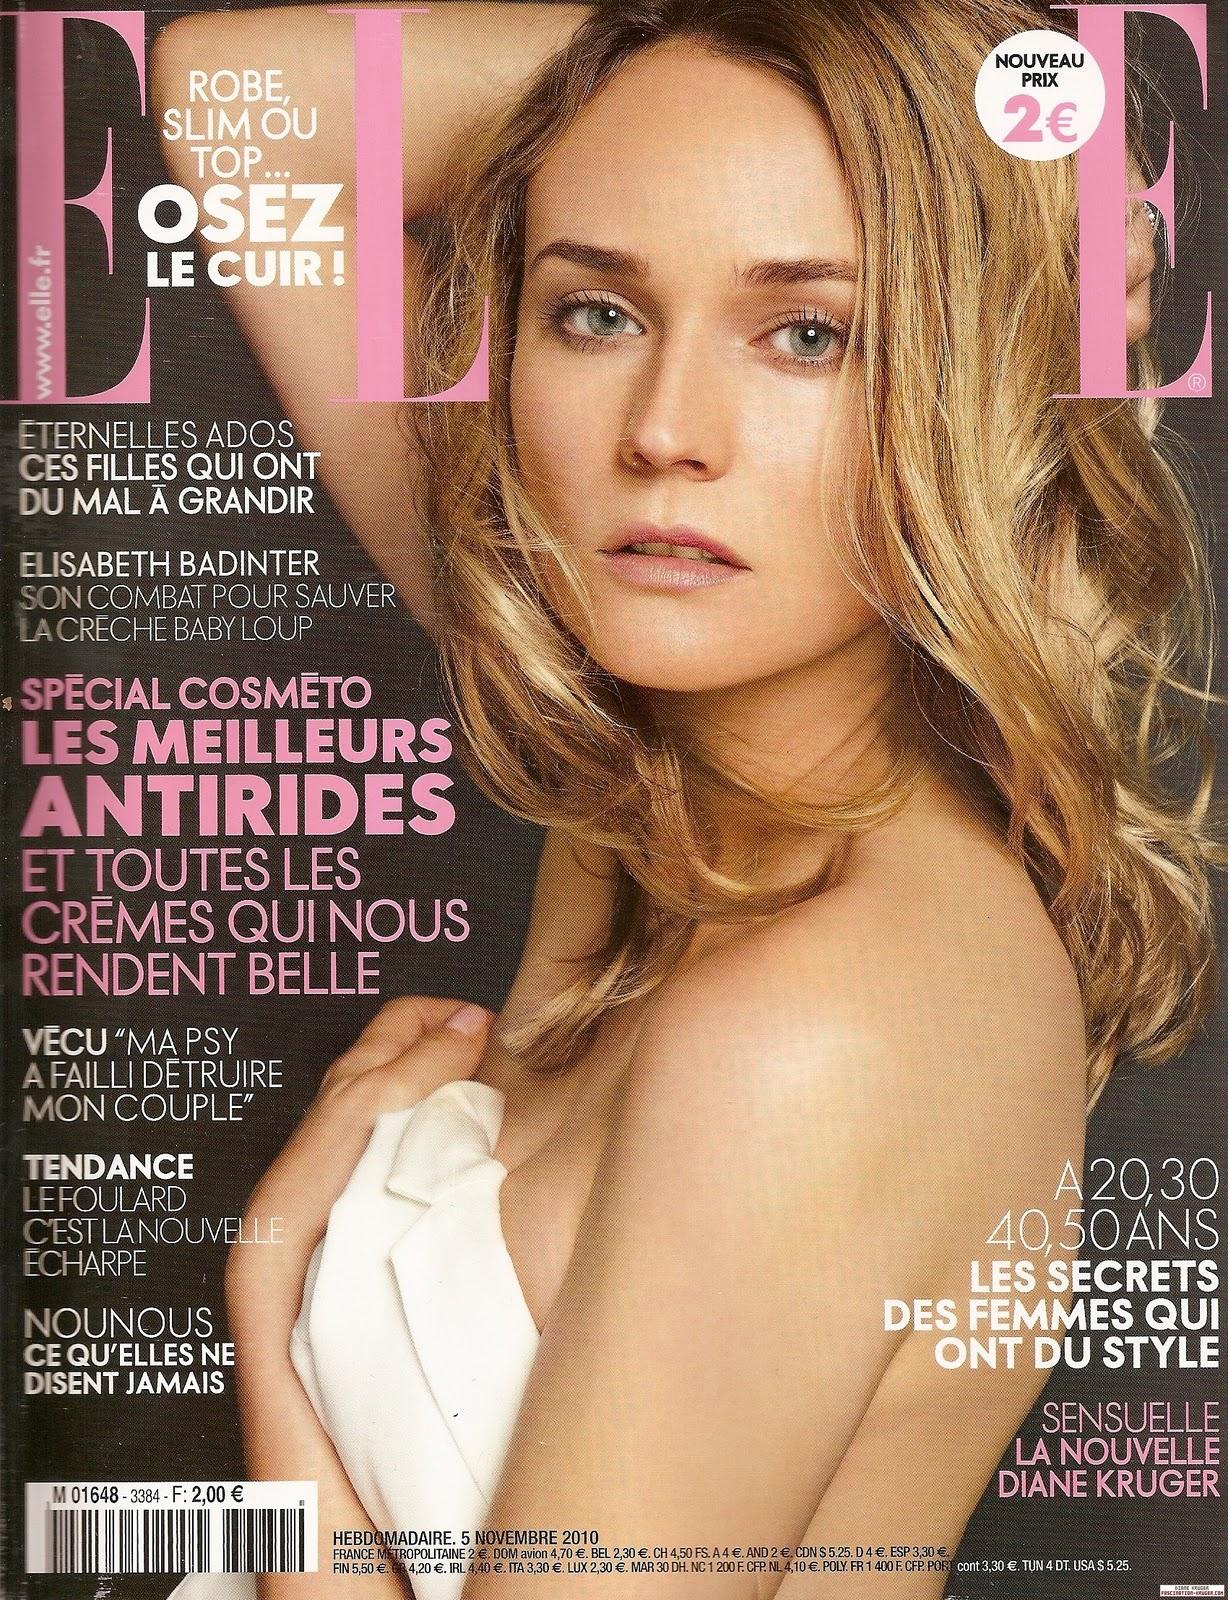 http://3.bp.blogspot.com/_pGTlBw_z2AM/TOa_k7u3z2I/AAAAAAAABCM/eWCvQQE-SHg/s1600/Diane+Kruger+Elle+topless+nude+seethrough+01.jpg